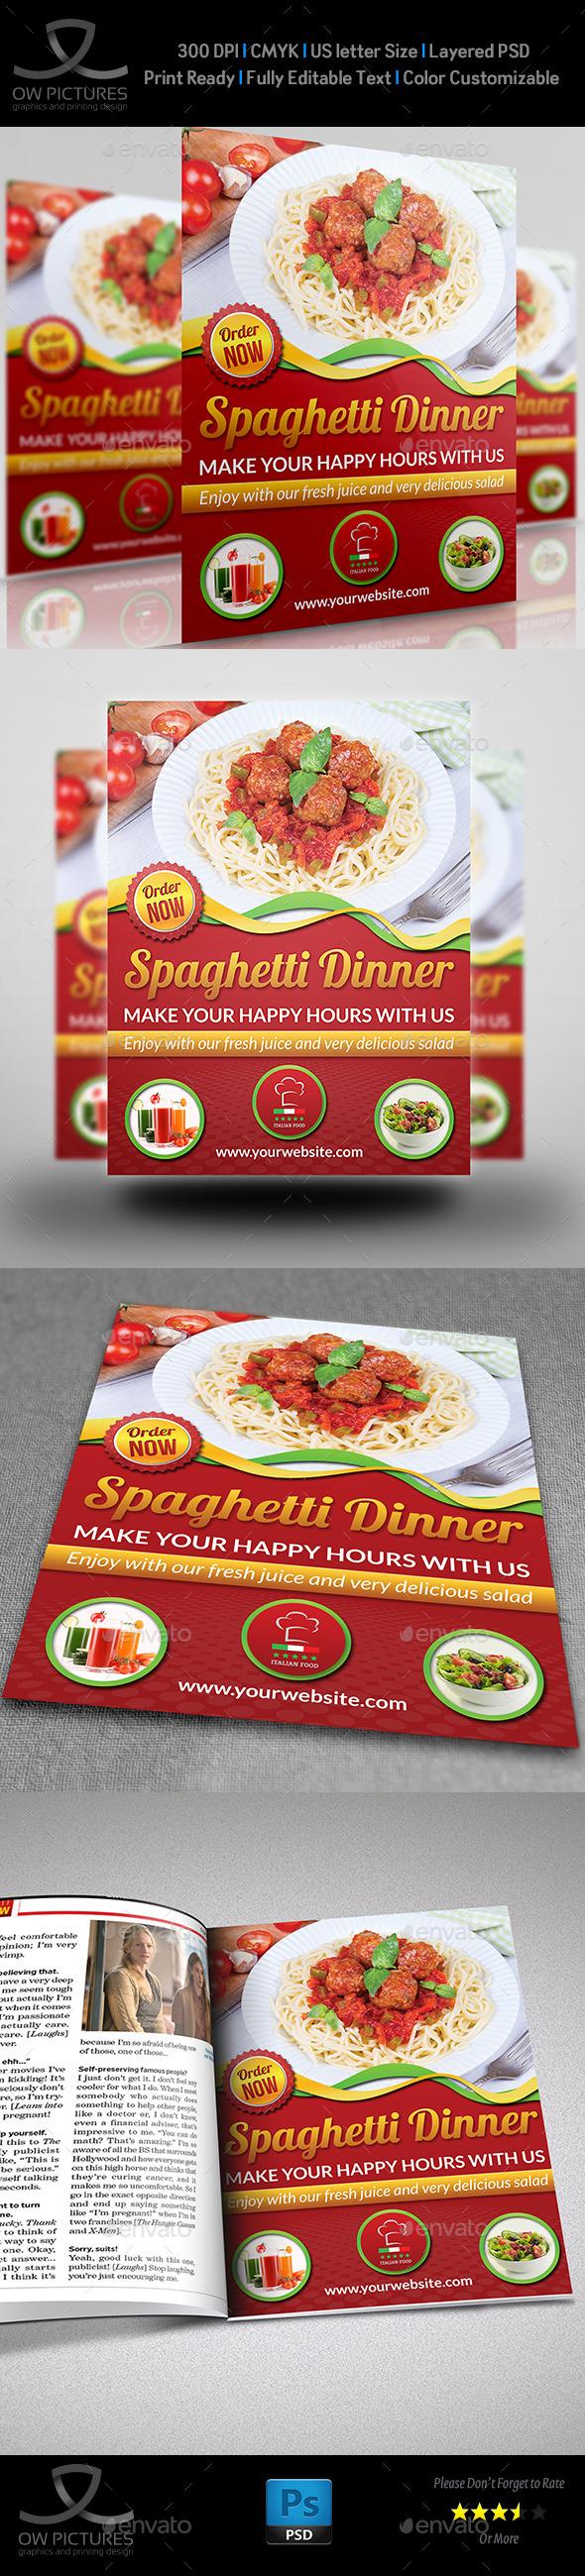 GraphicRiver Restaurant Flyer Template Vol.6 9845146